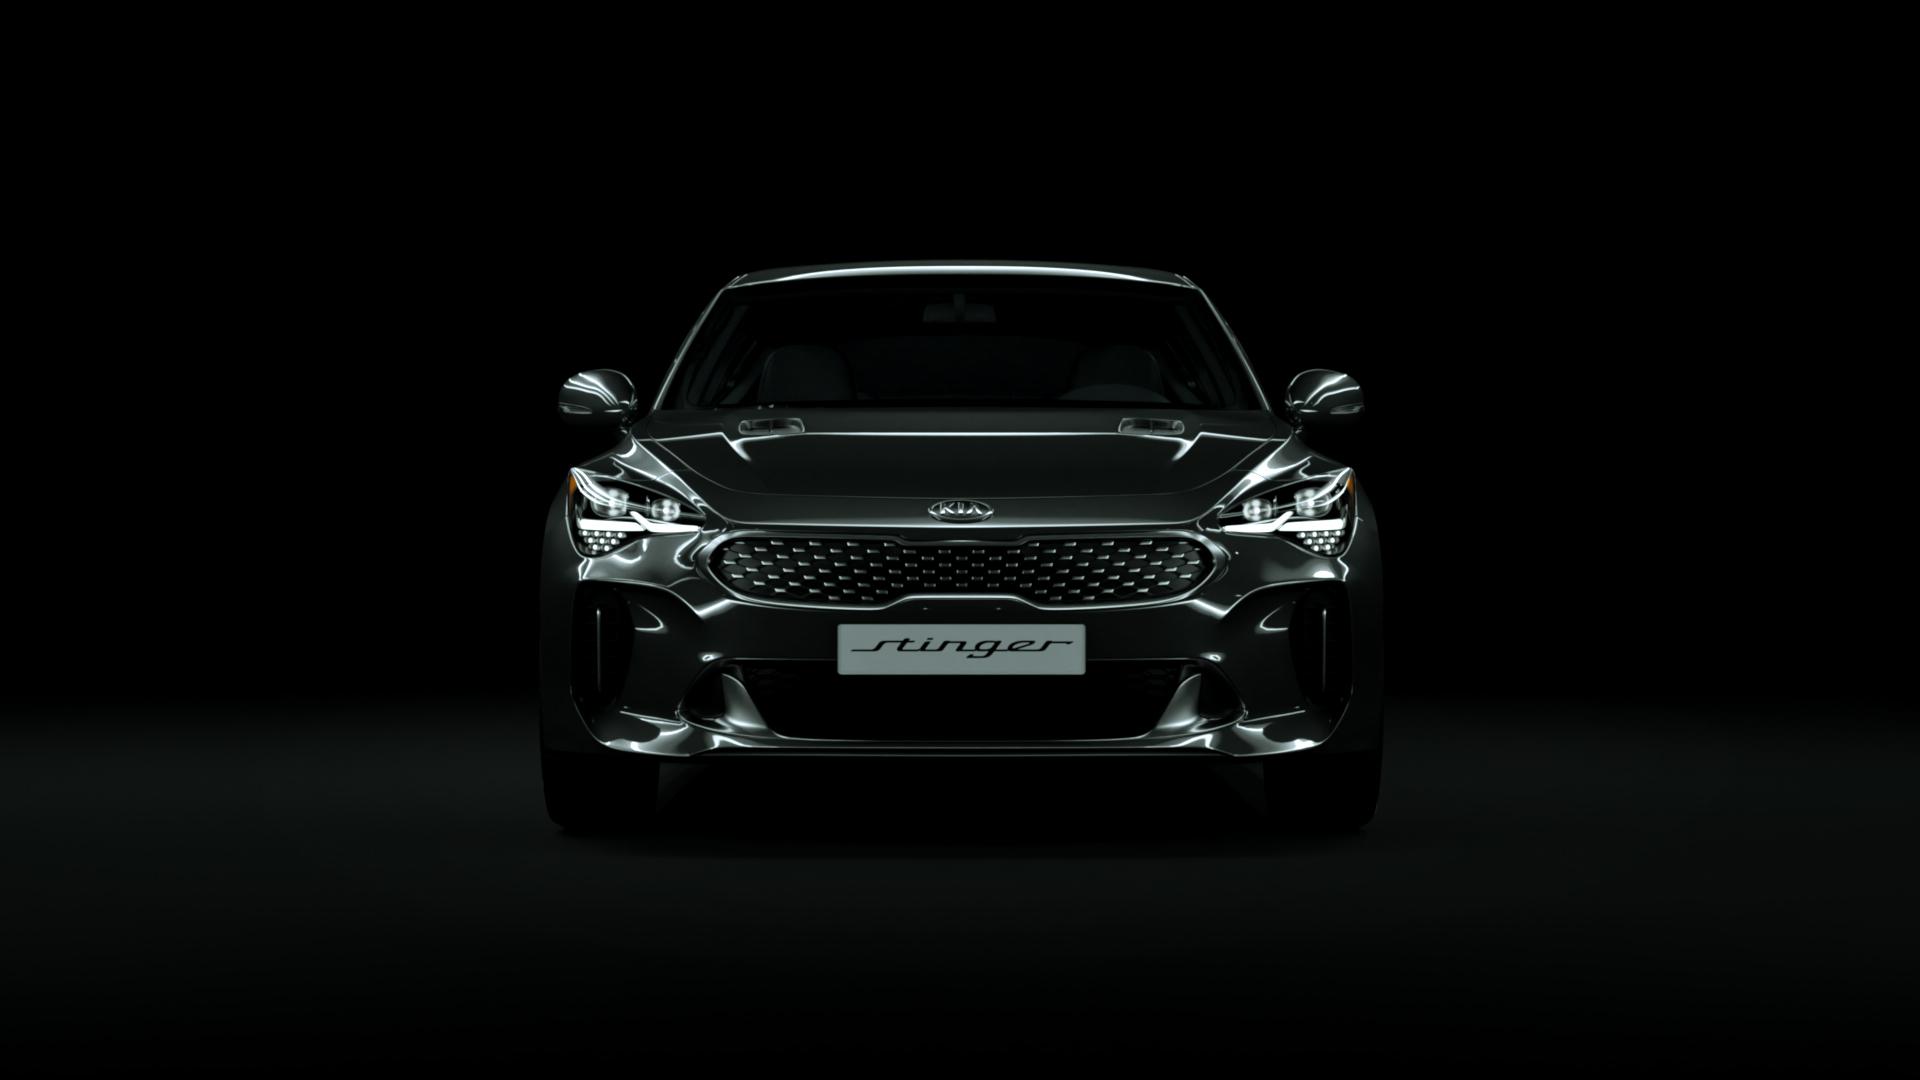 Cgi automotive studio